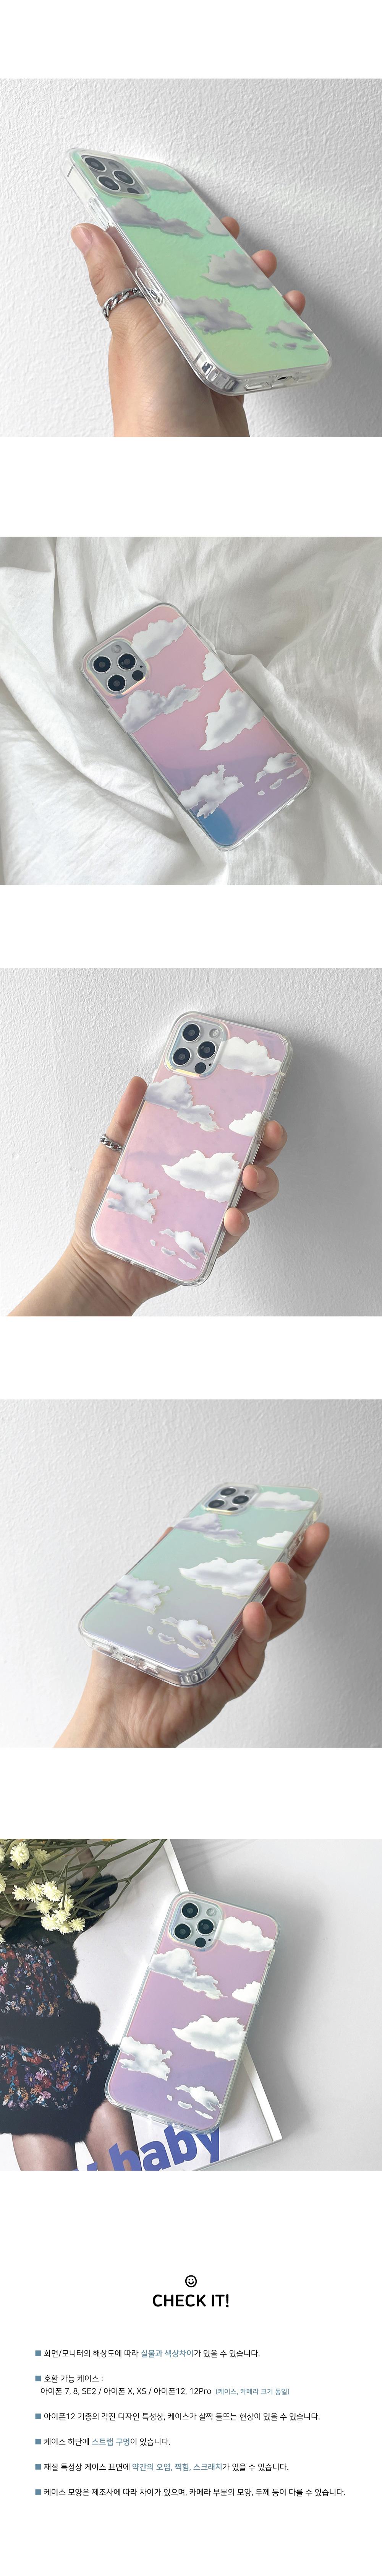 cloud cloud hologram mirror iphone case